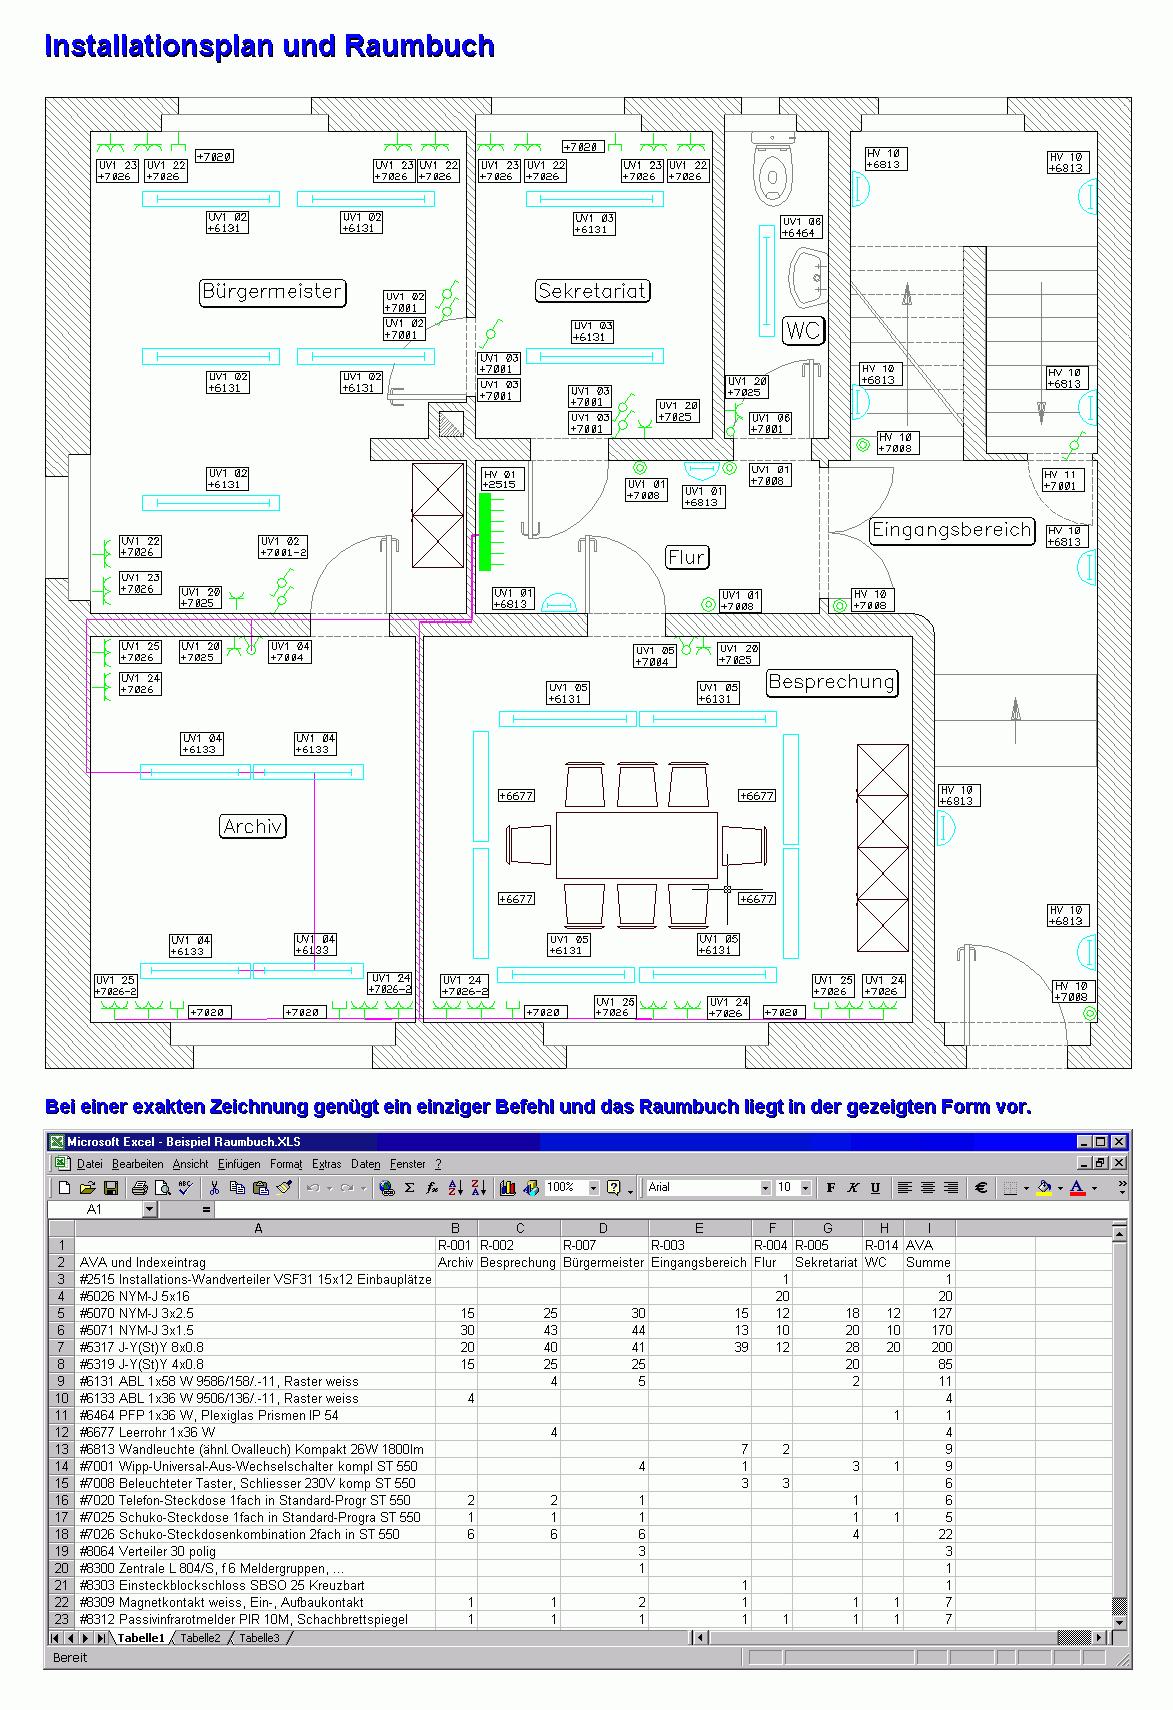 IBS-Döbeln - Ingenieurbüro Softwareentwicklung